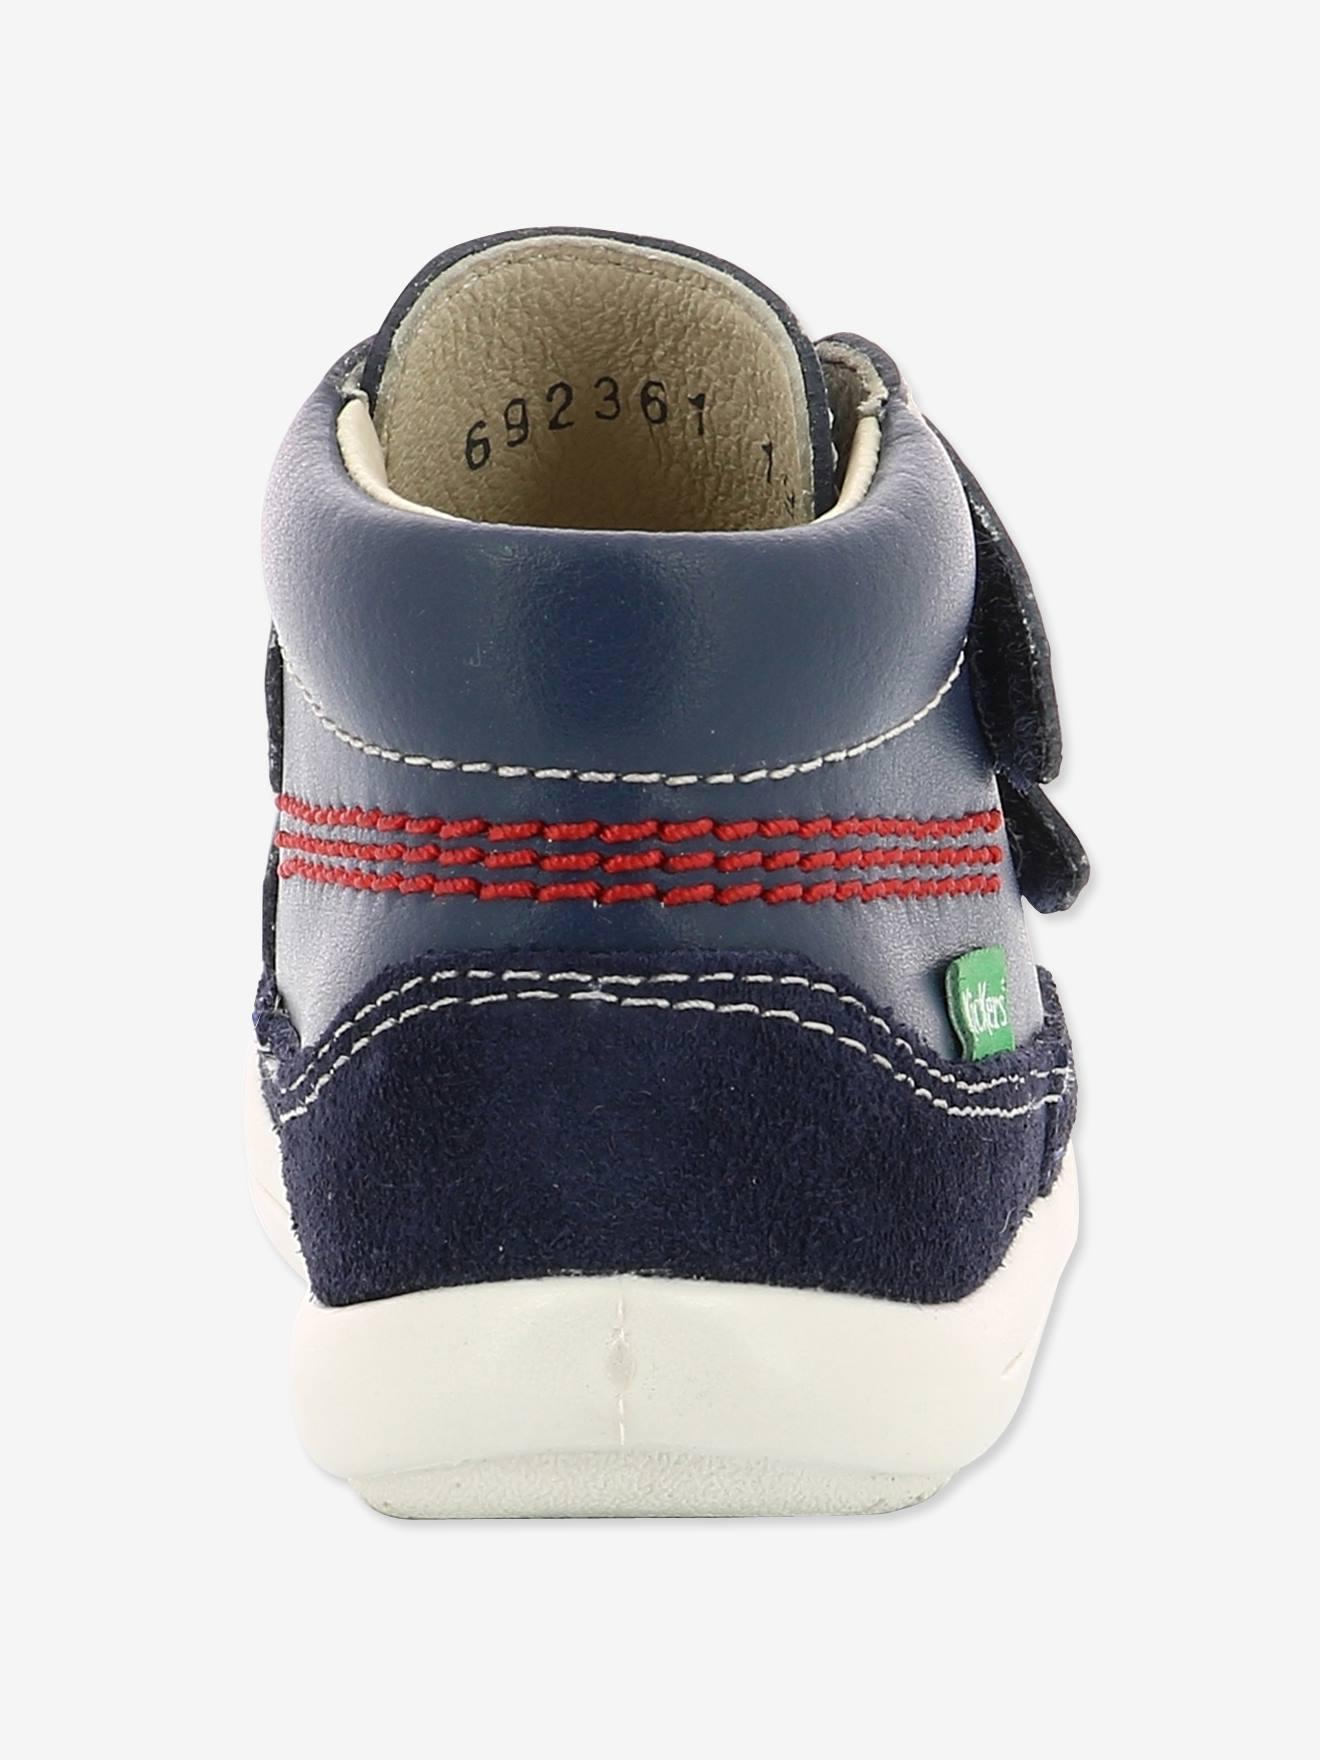 7810bccd8 Botines piel bebé Kimono KICKERS® azul oscuro liso - Kickers